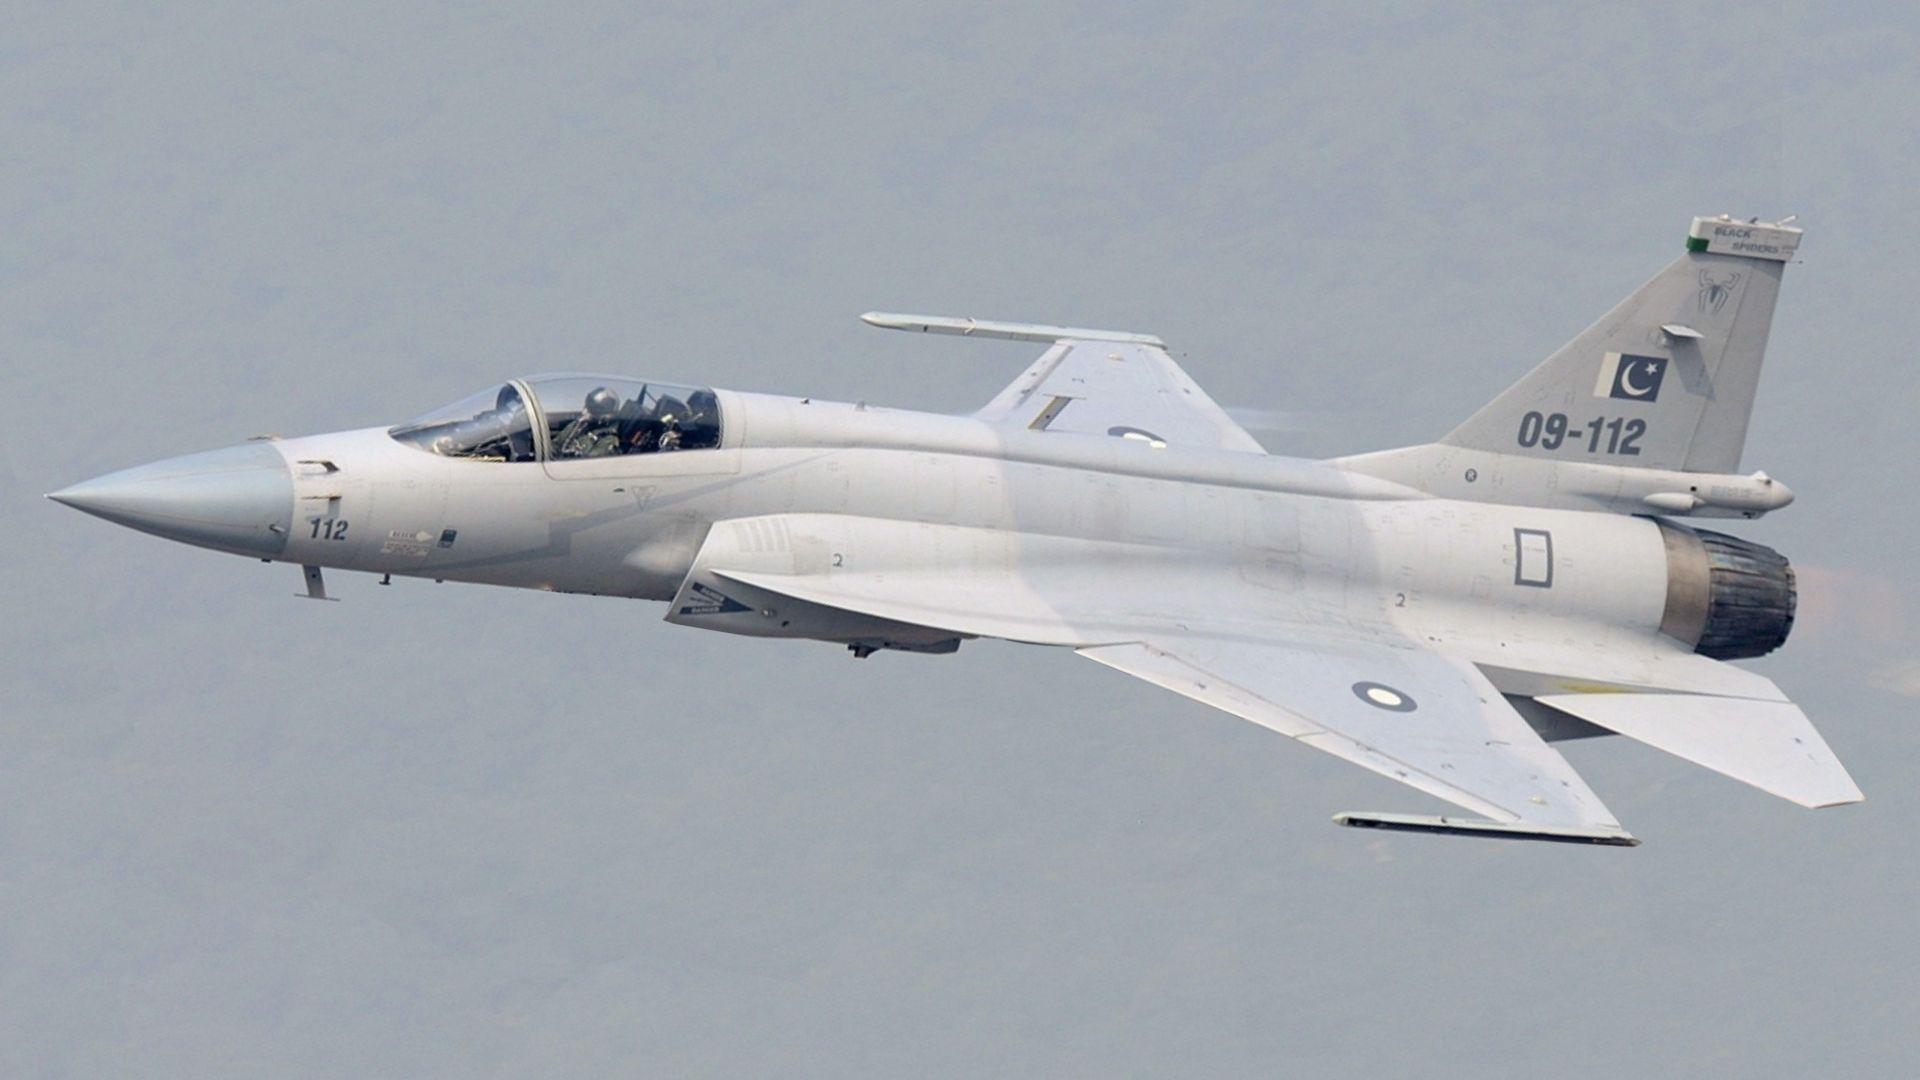 Как Китай и Пакистан направиха хибрид между МиГ-21 и F-16